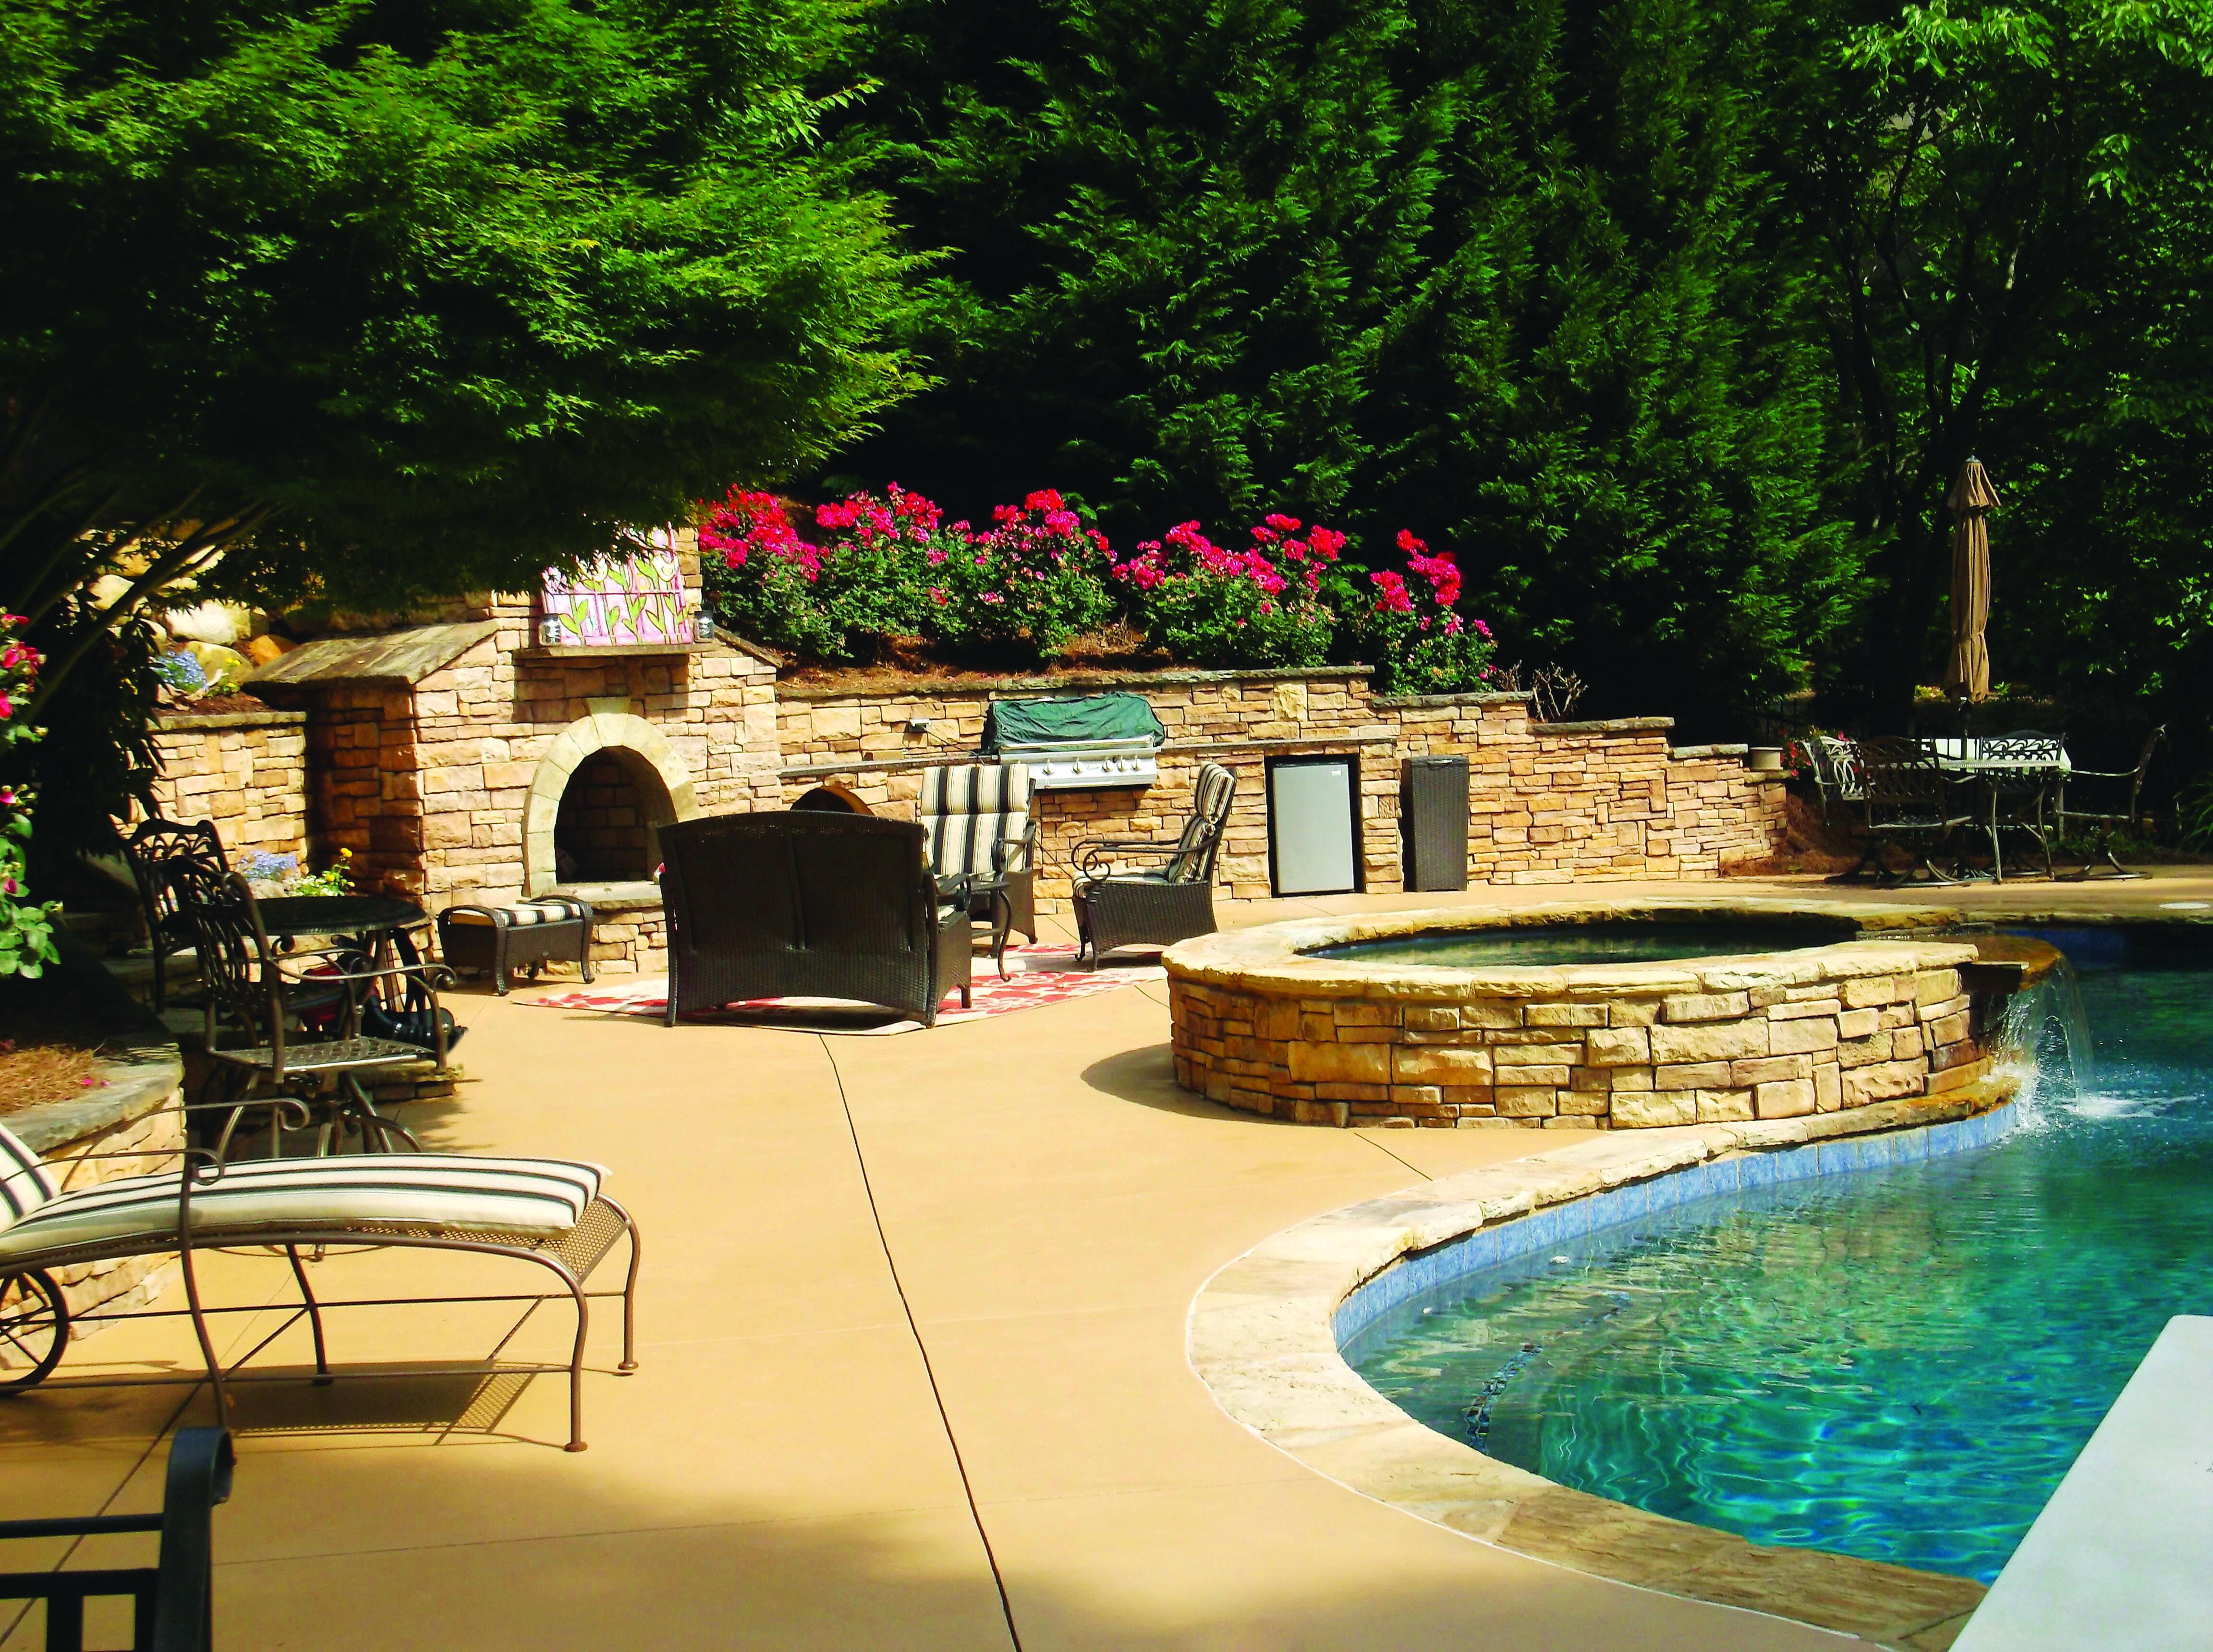 Attractive Add A Concrete Overlay To Your Pool Deck To Rejuvenate Your Backyard And  Lounging Area. BetonbeckenBeton BastelnBeton DeckschichtDekorativer ...